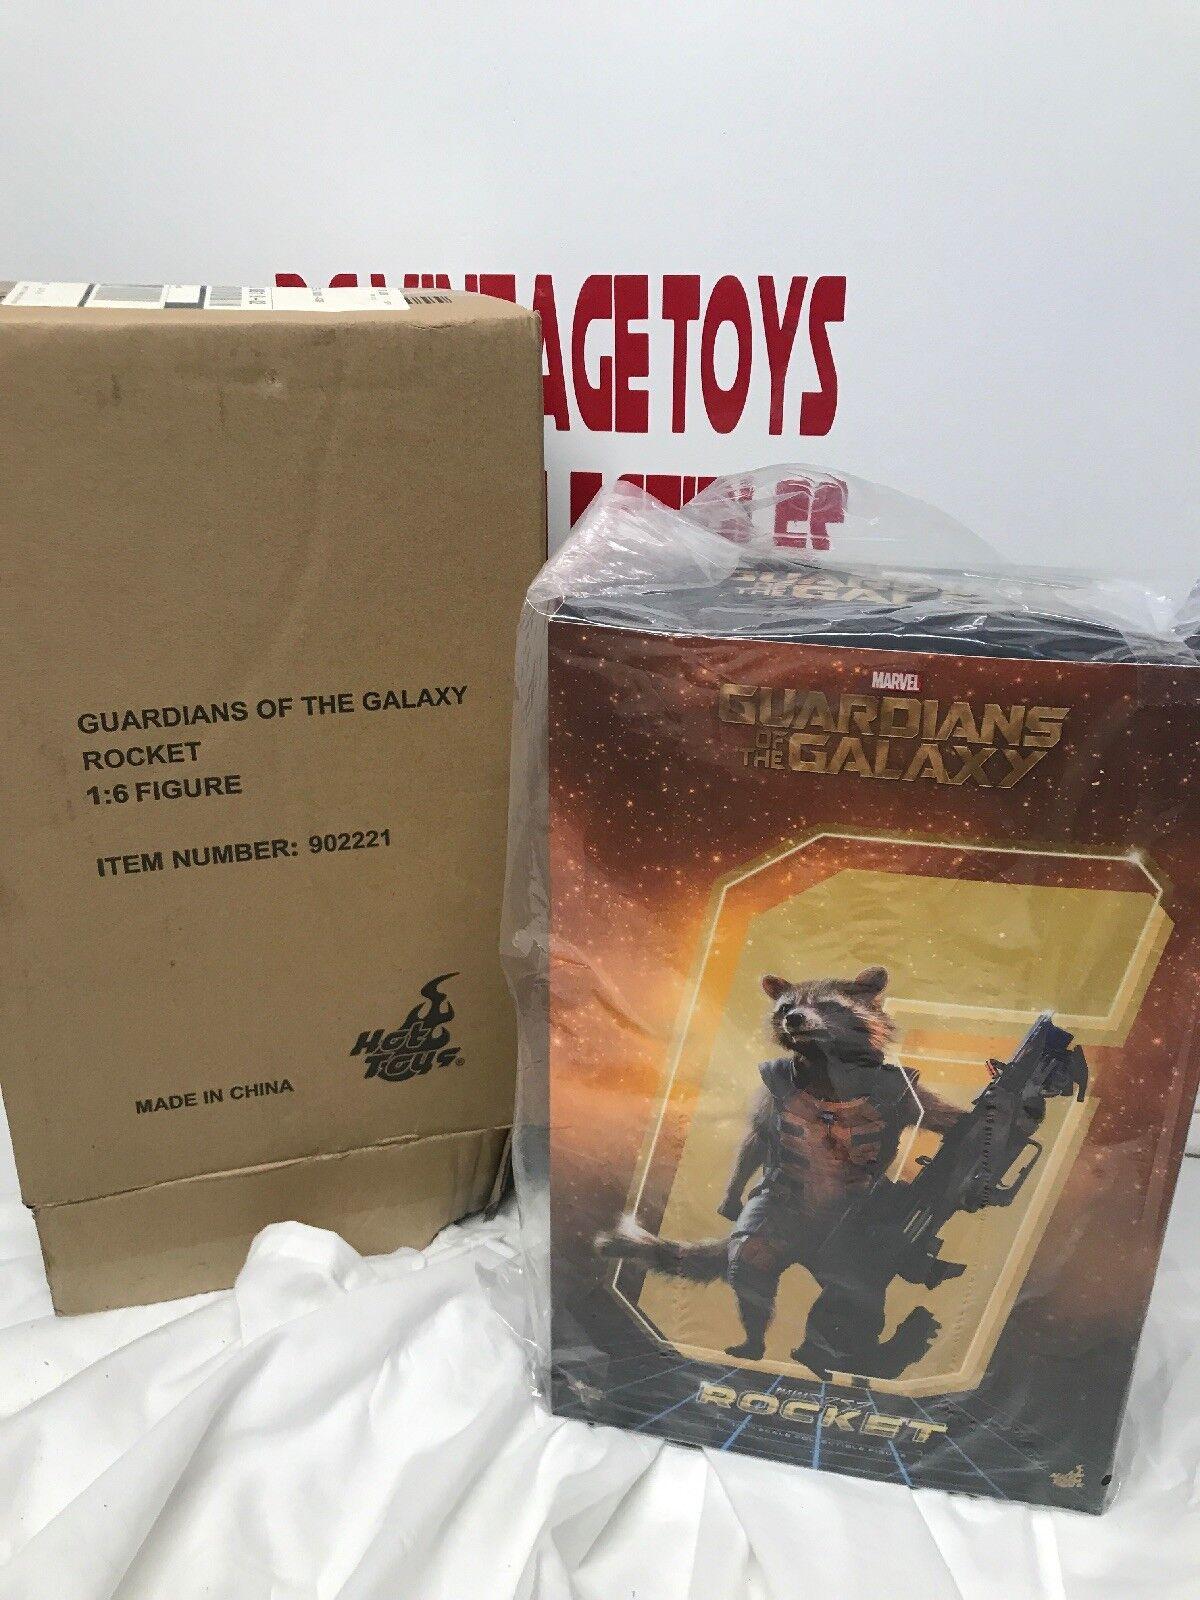 Guardians of the Galaxy Rocket 1 6 escala HOT TOYS figura GotG